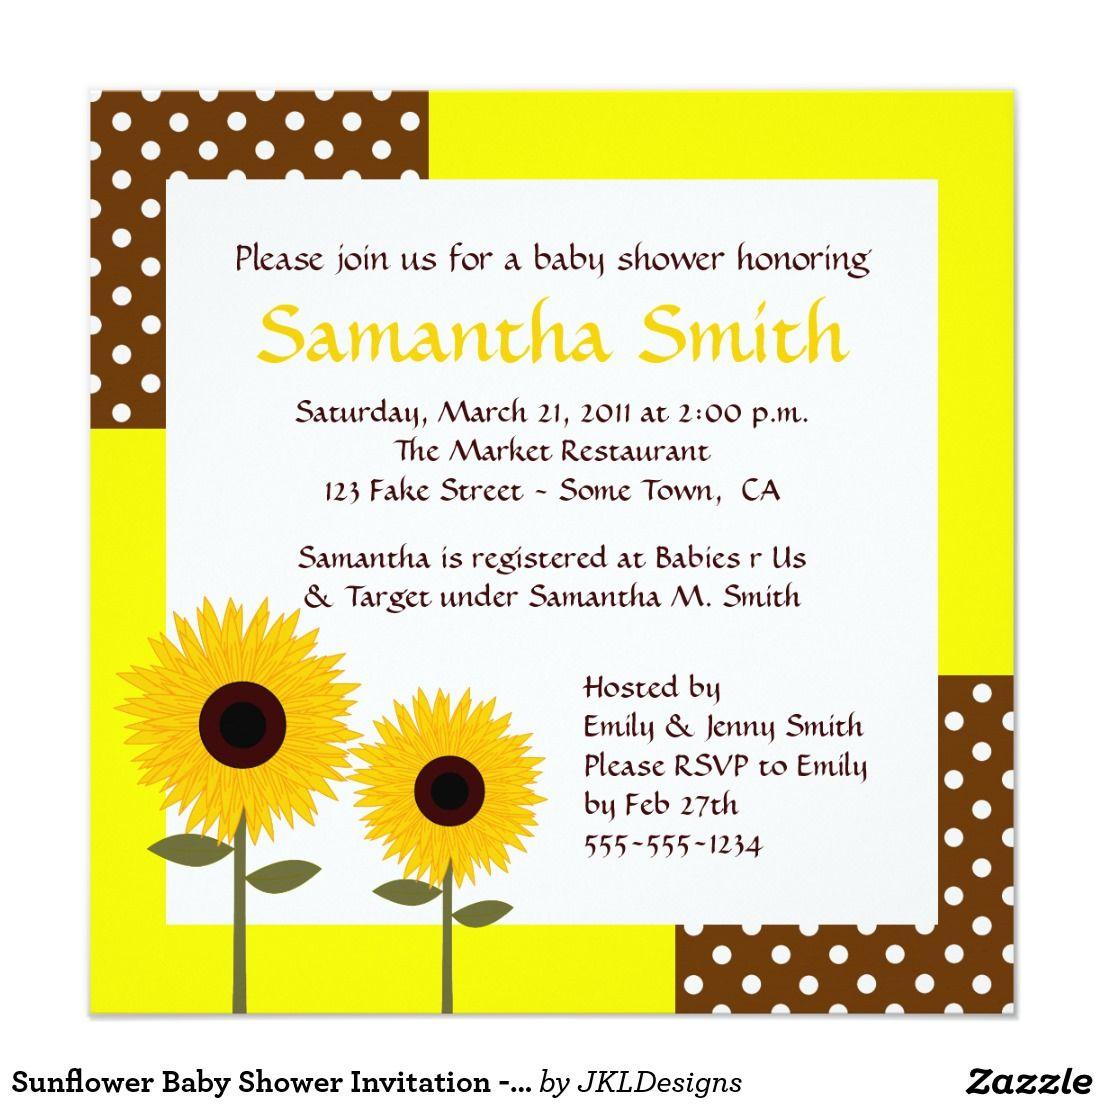 Sunflower baby shower invitation yellow brown sunflower sunflower baby shower invitation yellow brown filmwisefo